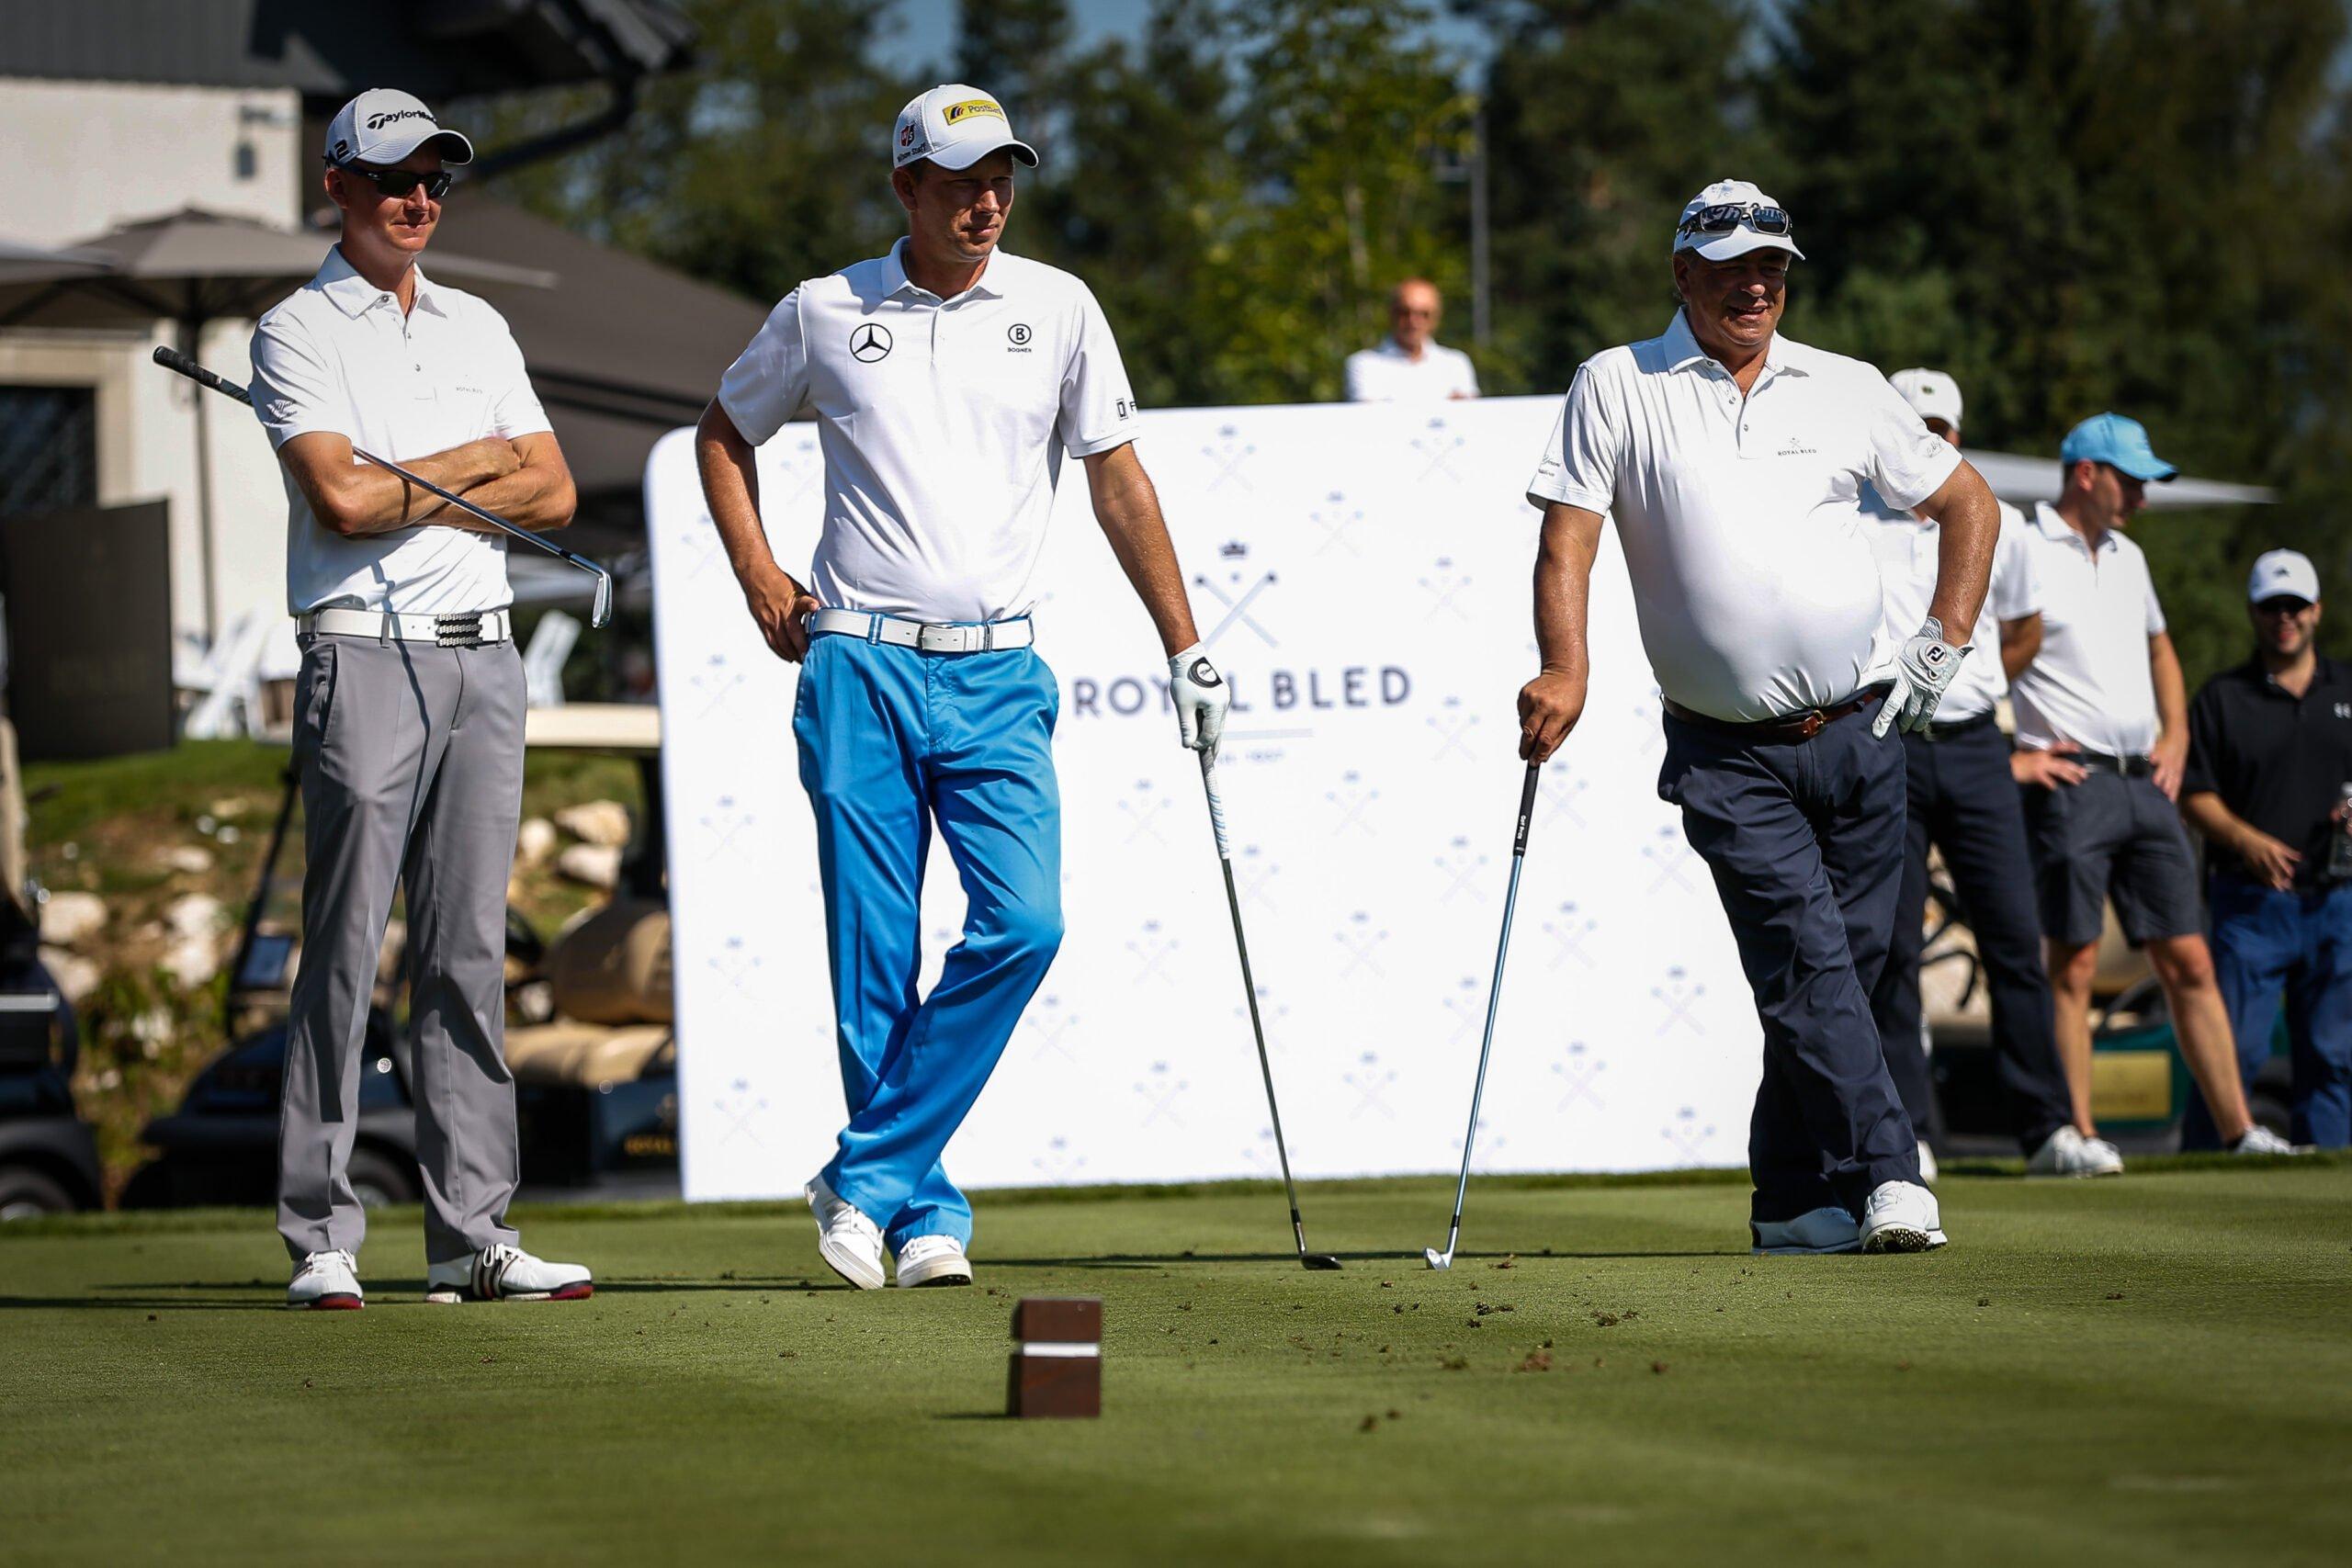 Royal Bled golf klub scaled